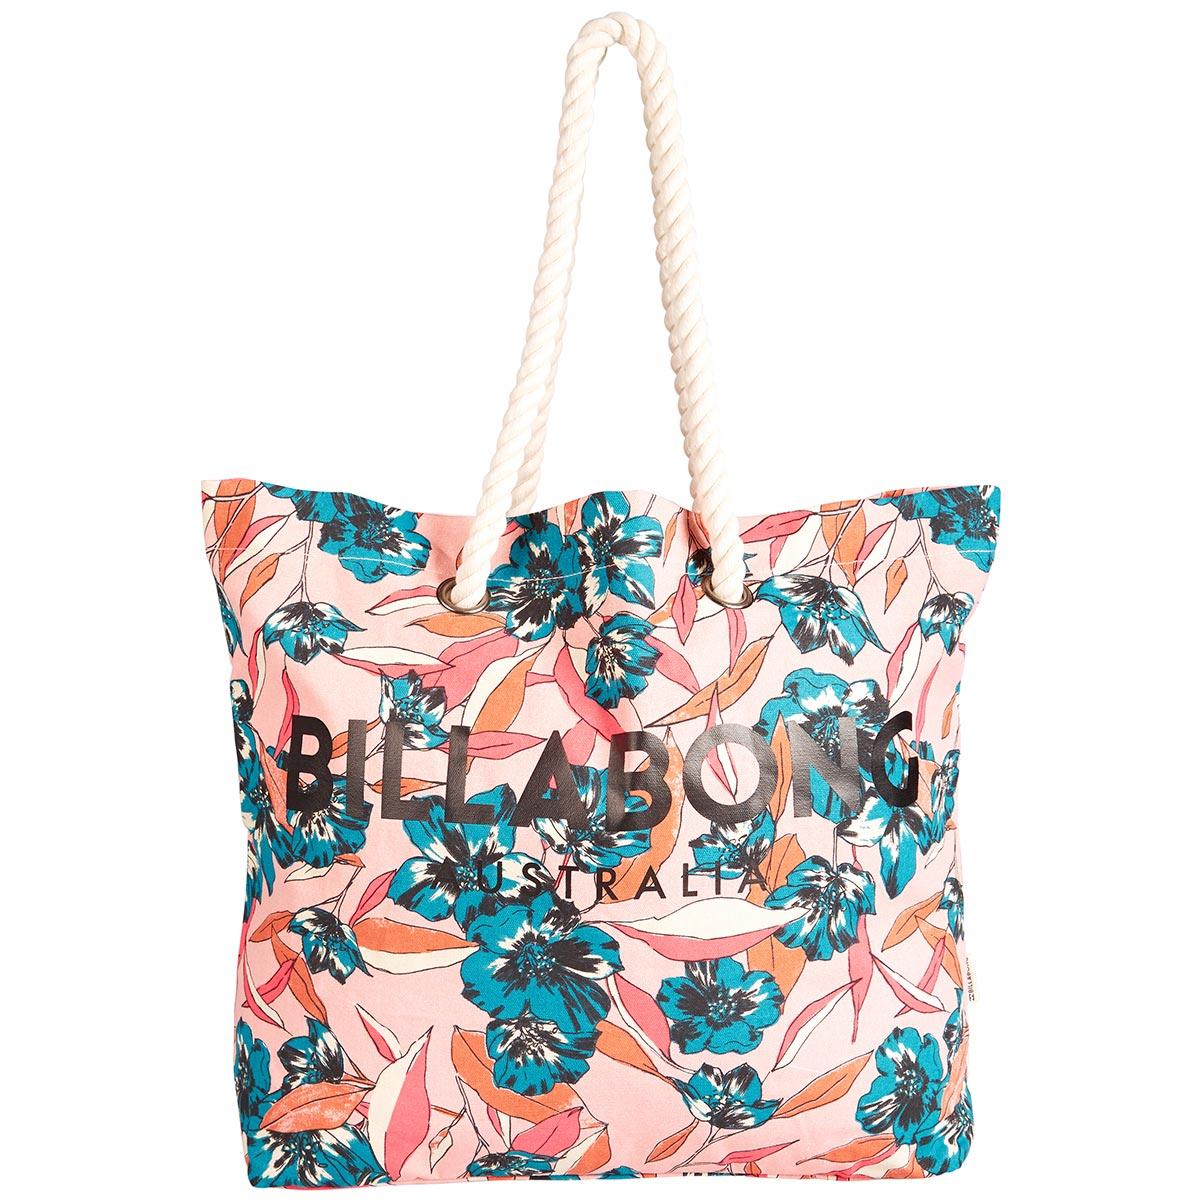 serviette de plage rose et blanc billabong serviette tendance. Black Bedroom Furniture Sets. Home Design Ideas